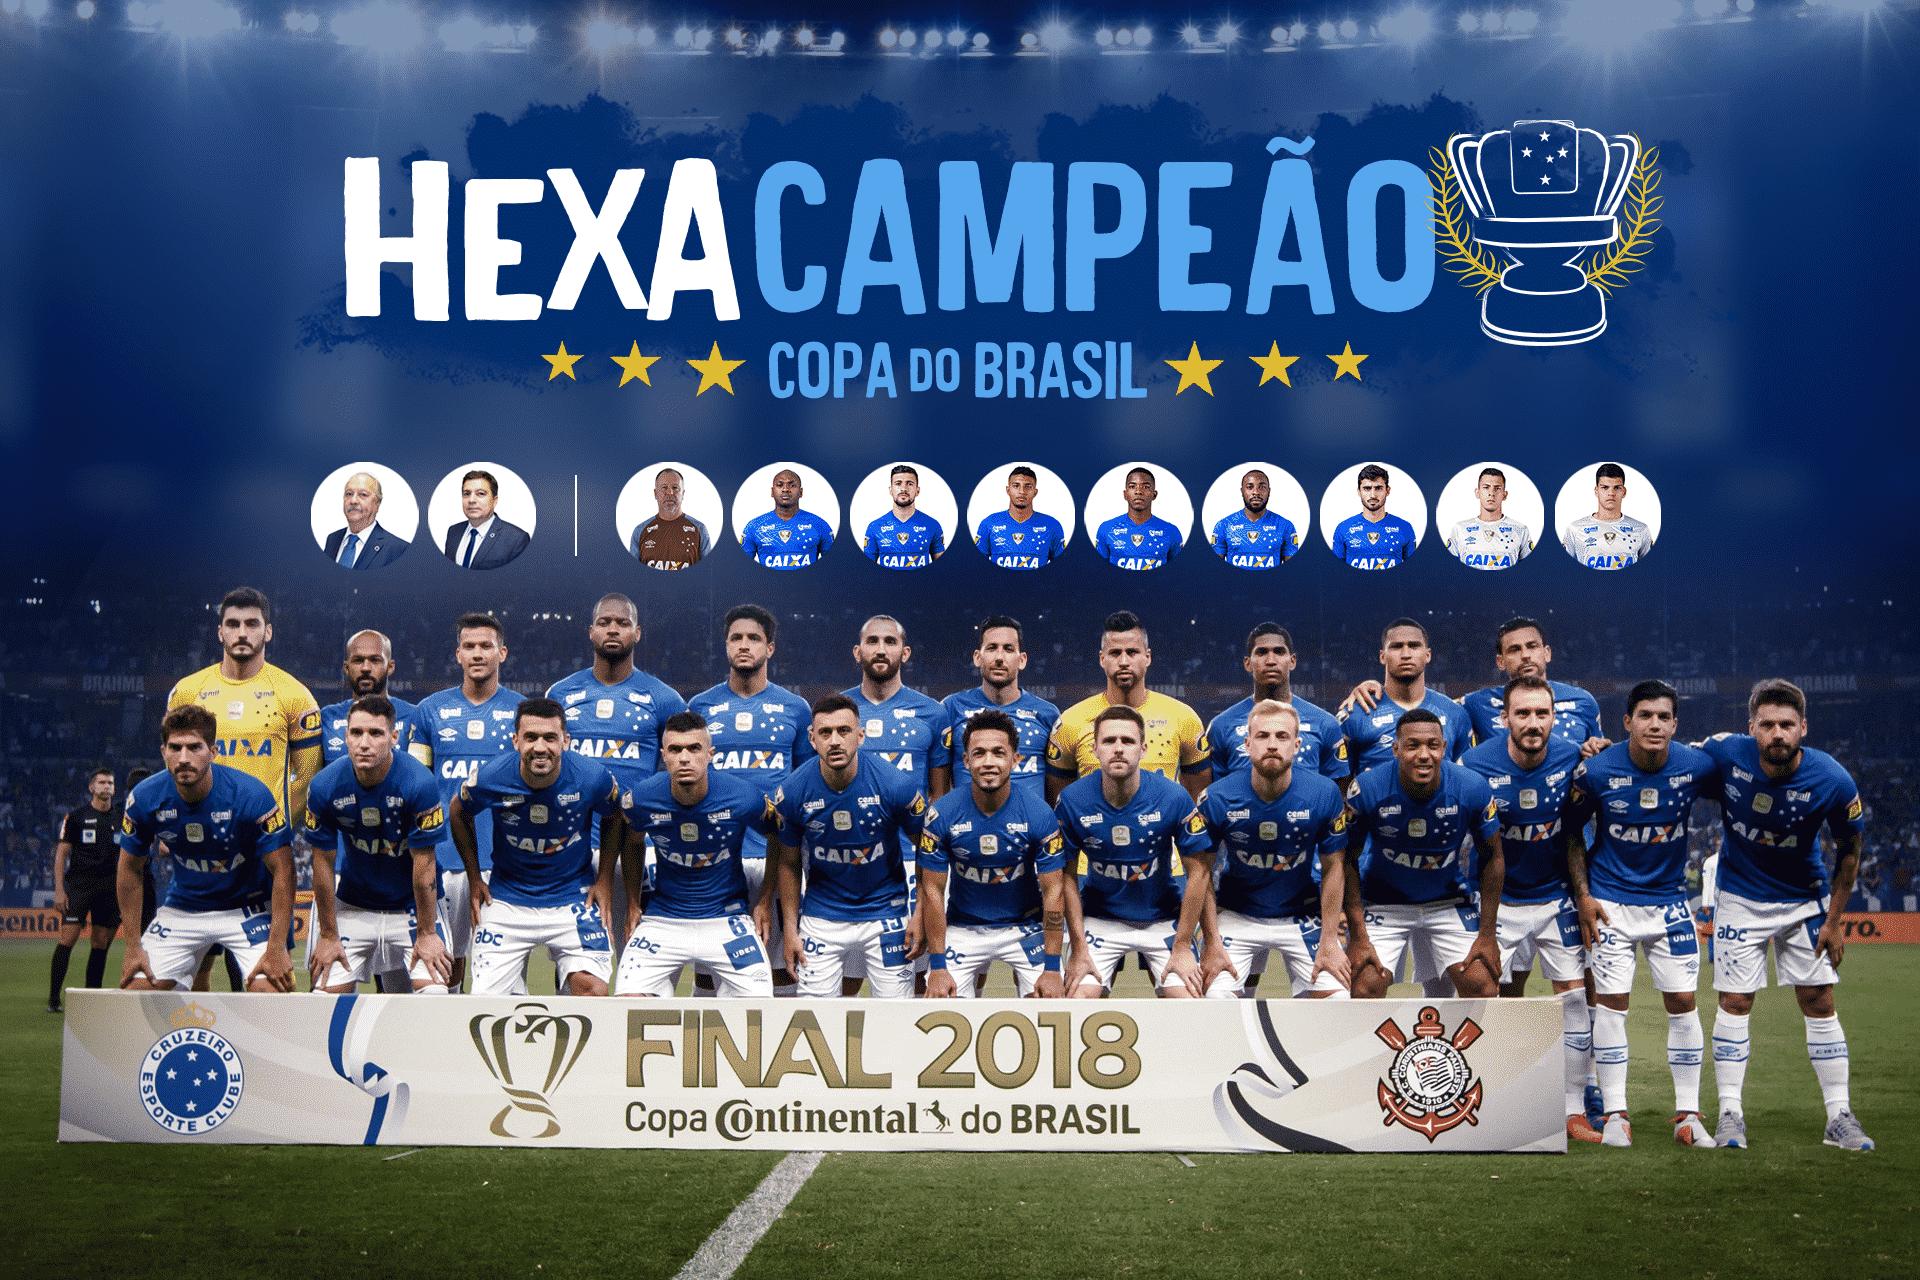 Cruzeiro - Hexacampeonato